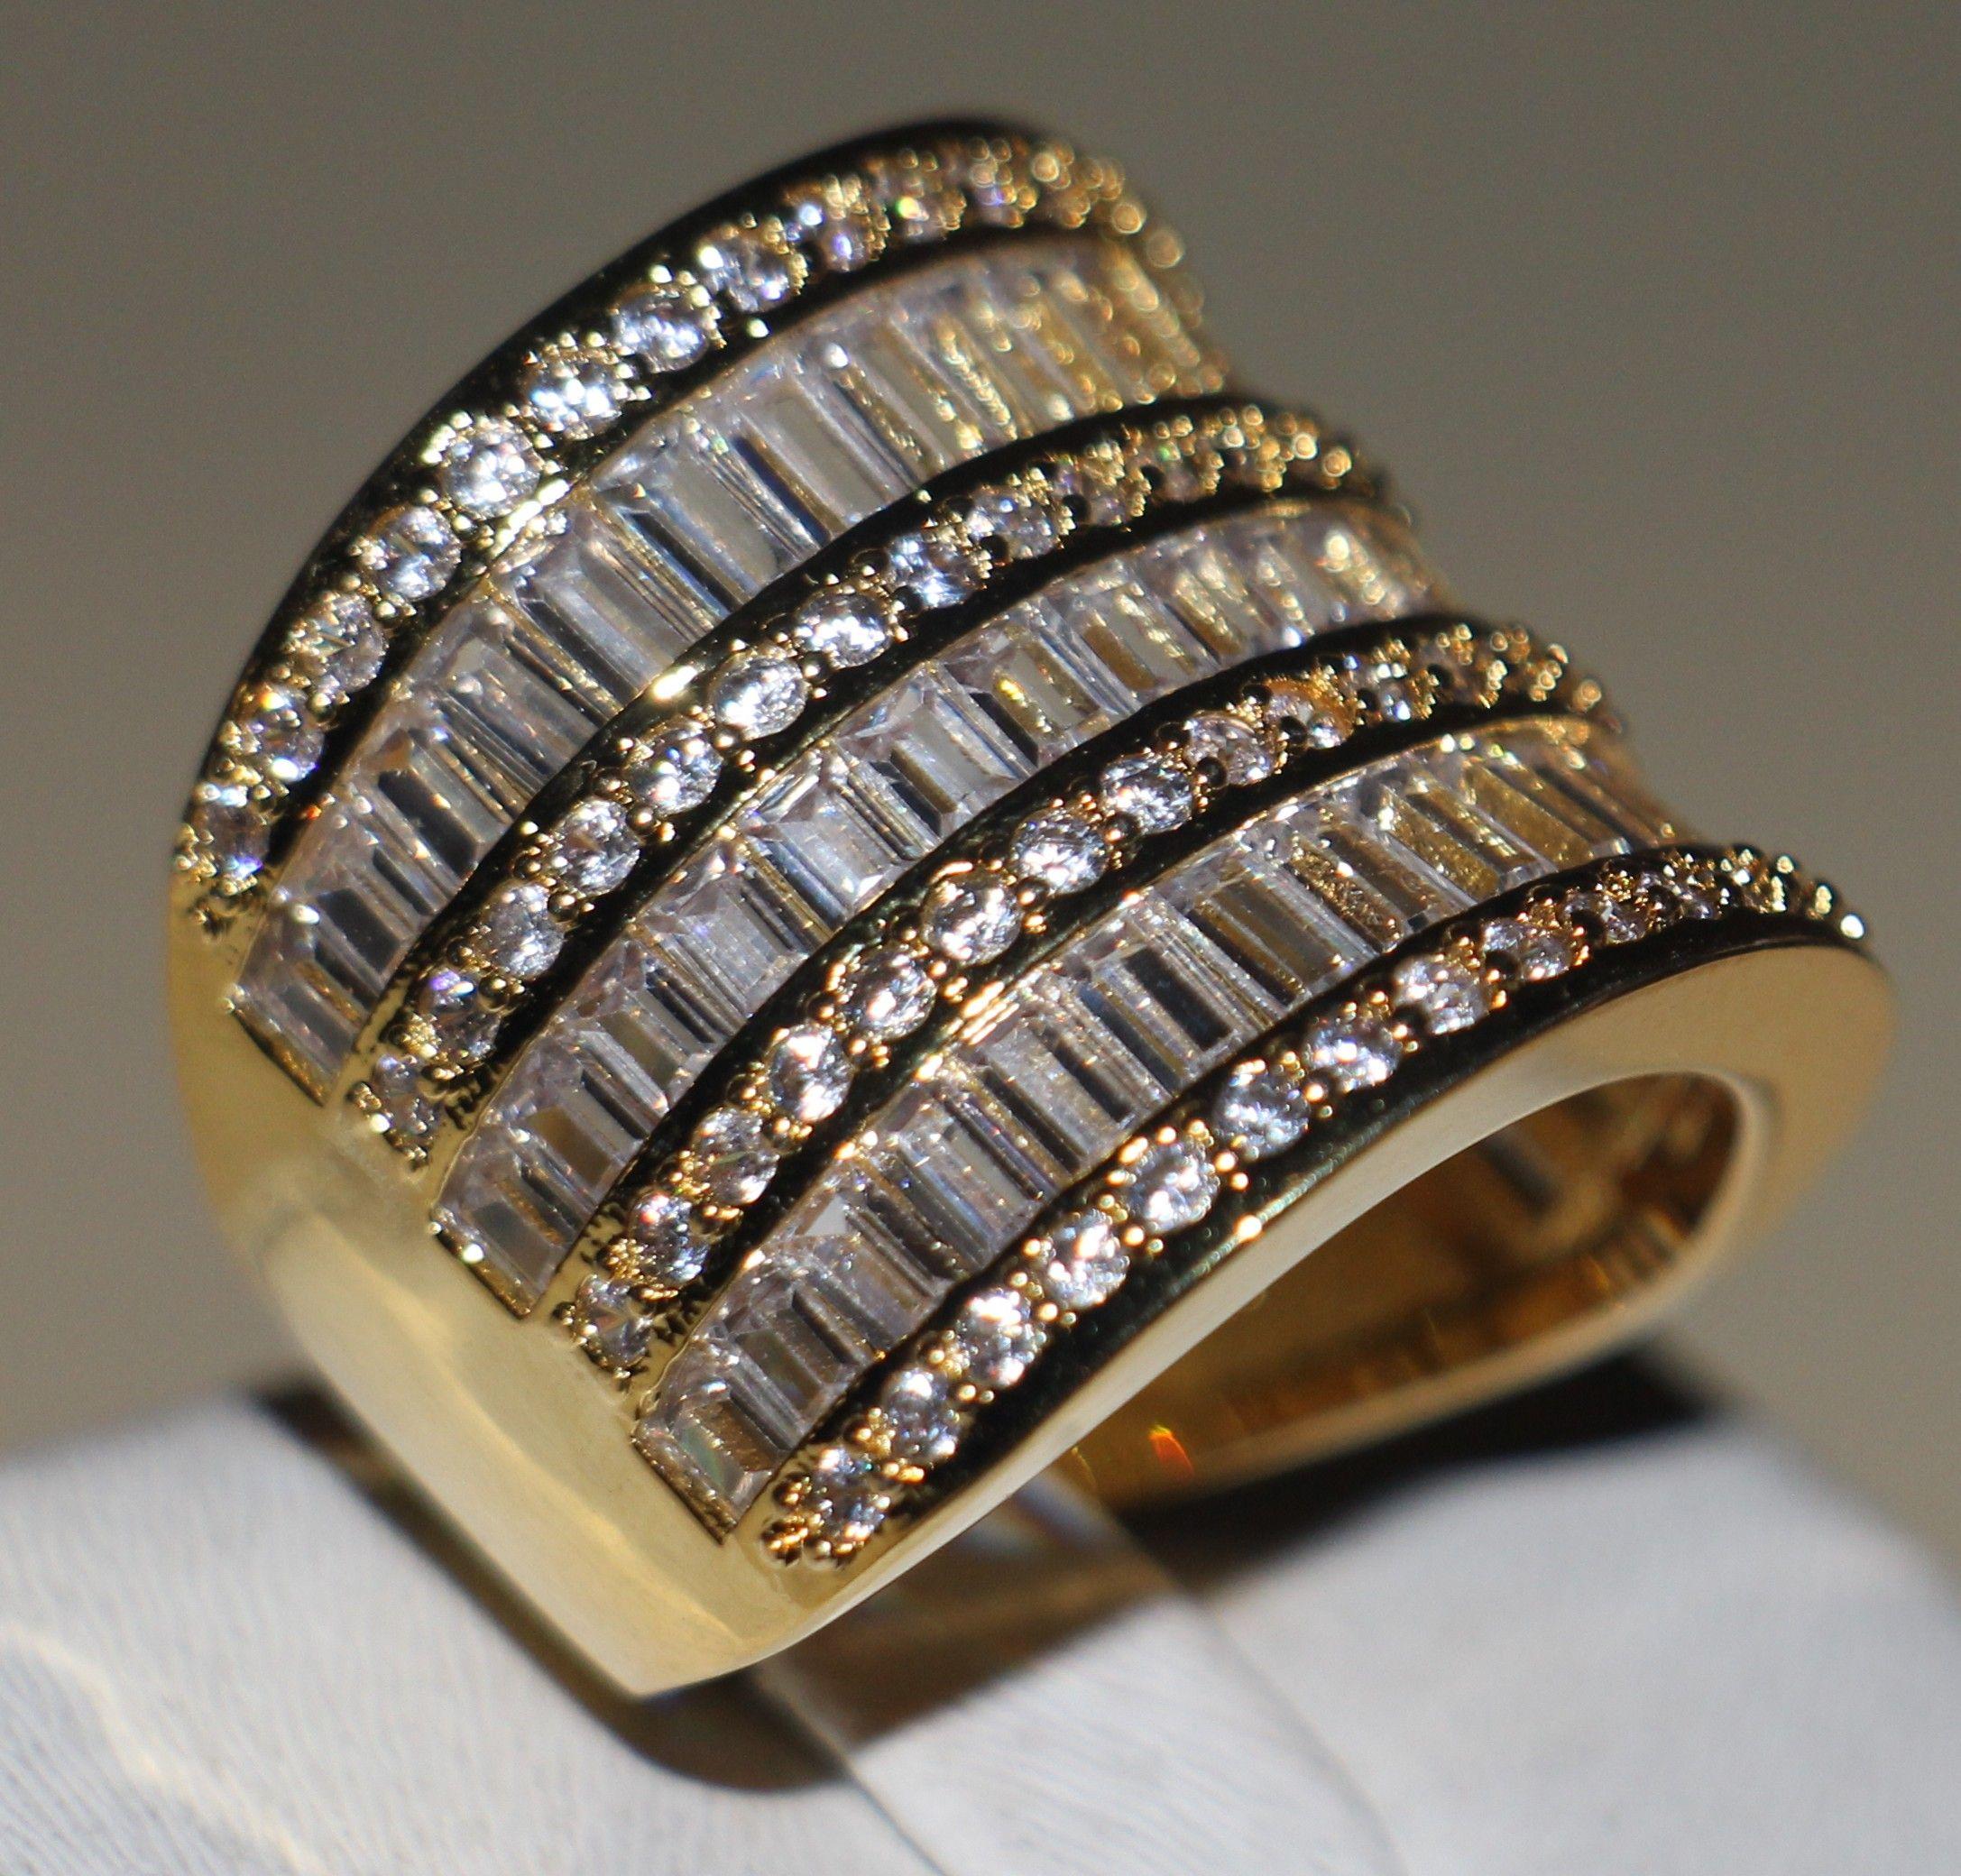 Victoria Wieck Women Luxury Jewelry Princess Cut 925 Sterliing Silver Yellow Gold Plated Topaz Simulated Diamond Wedding Band Ring Size 5-11